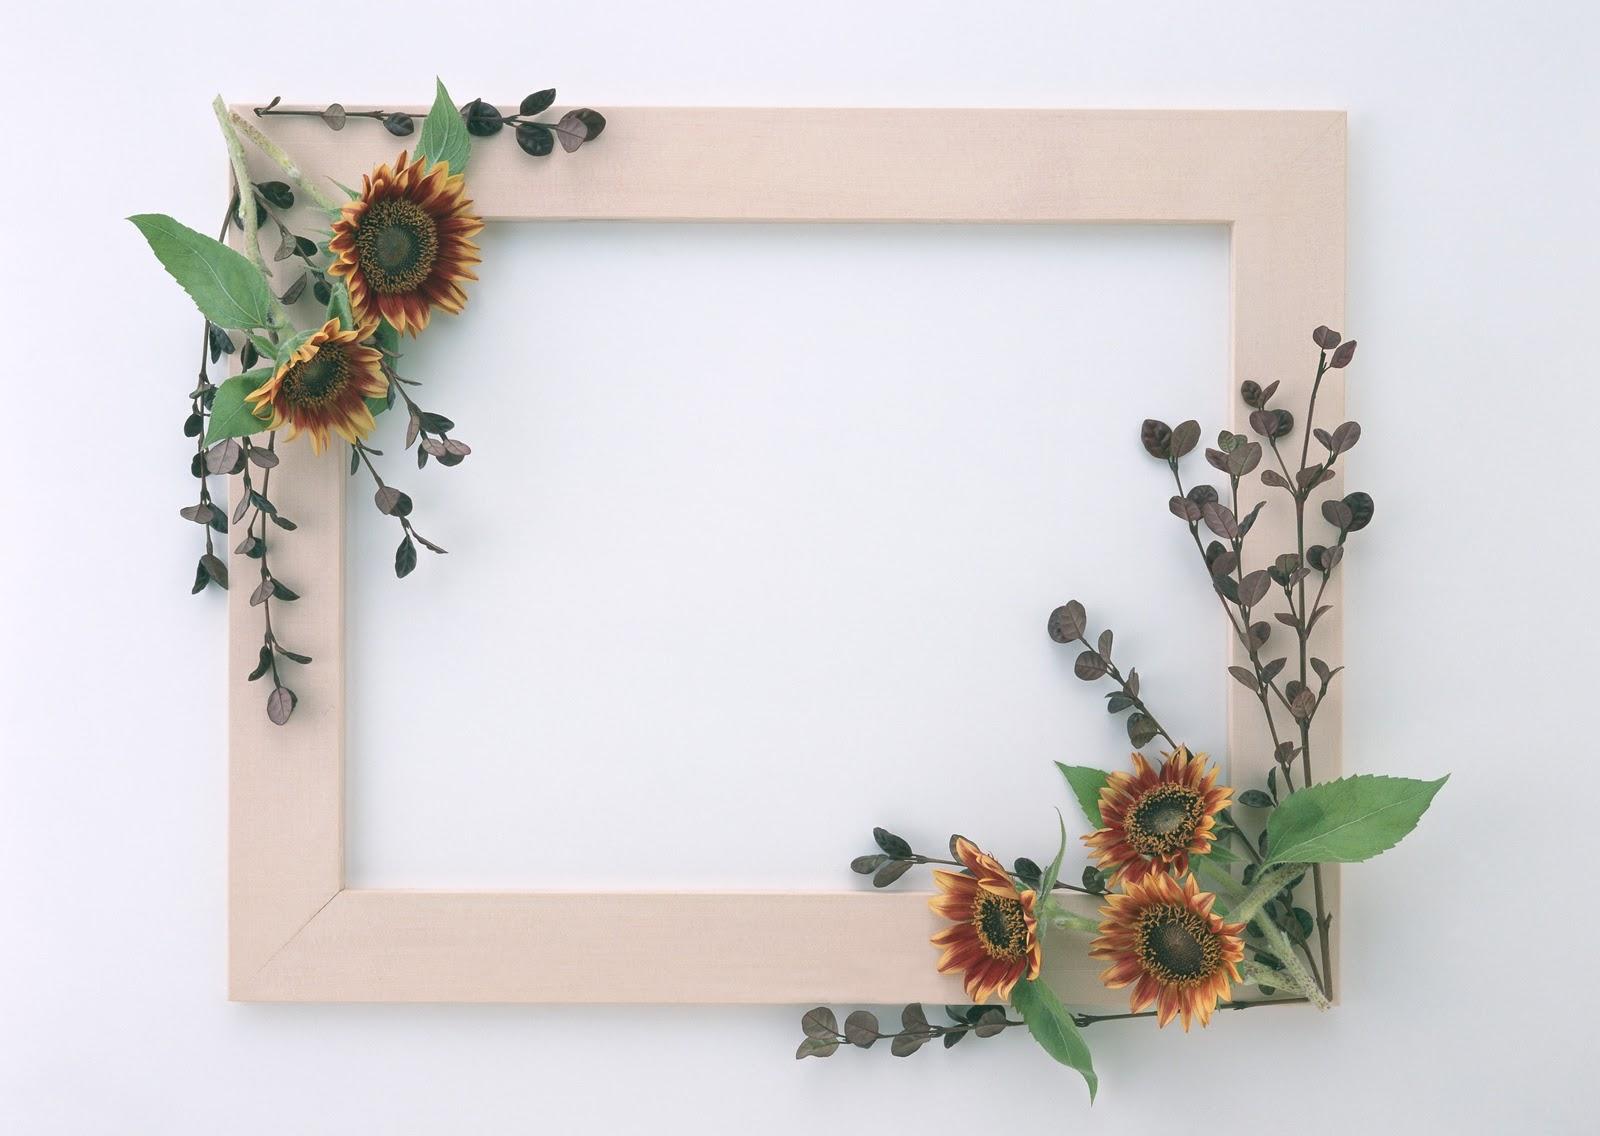 Picture Frame Love Wallpaper: [43+] HD Photo Frame Wallpaper On WallpaperSafari